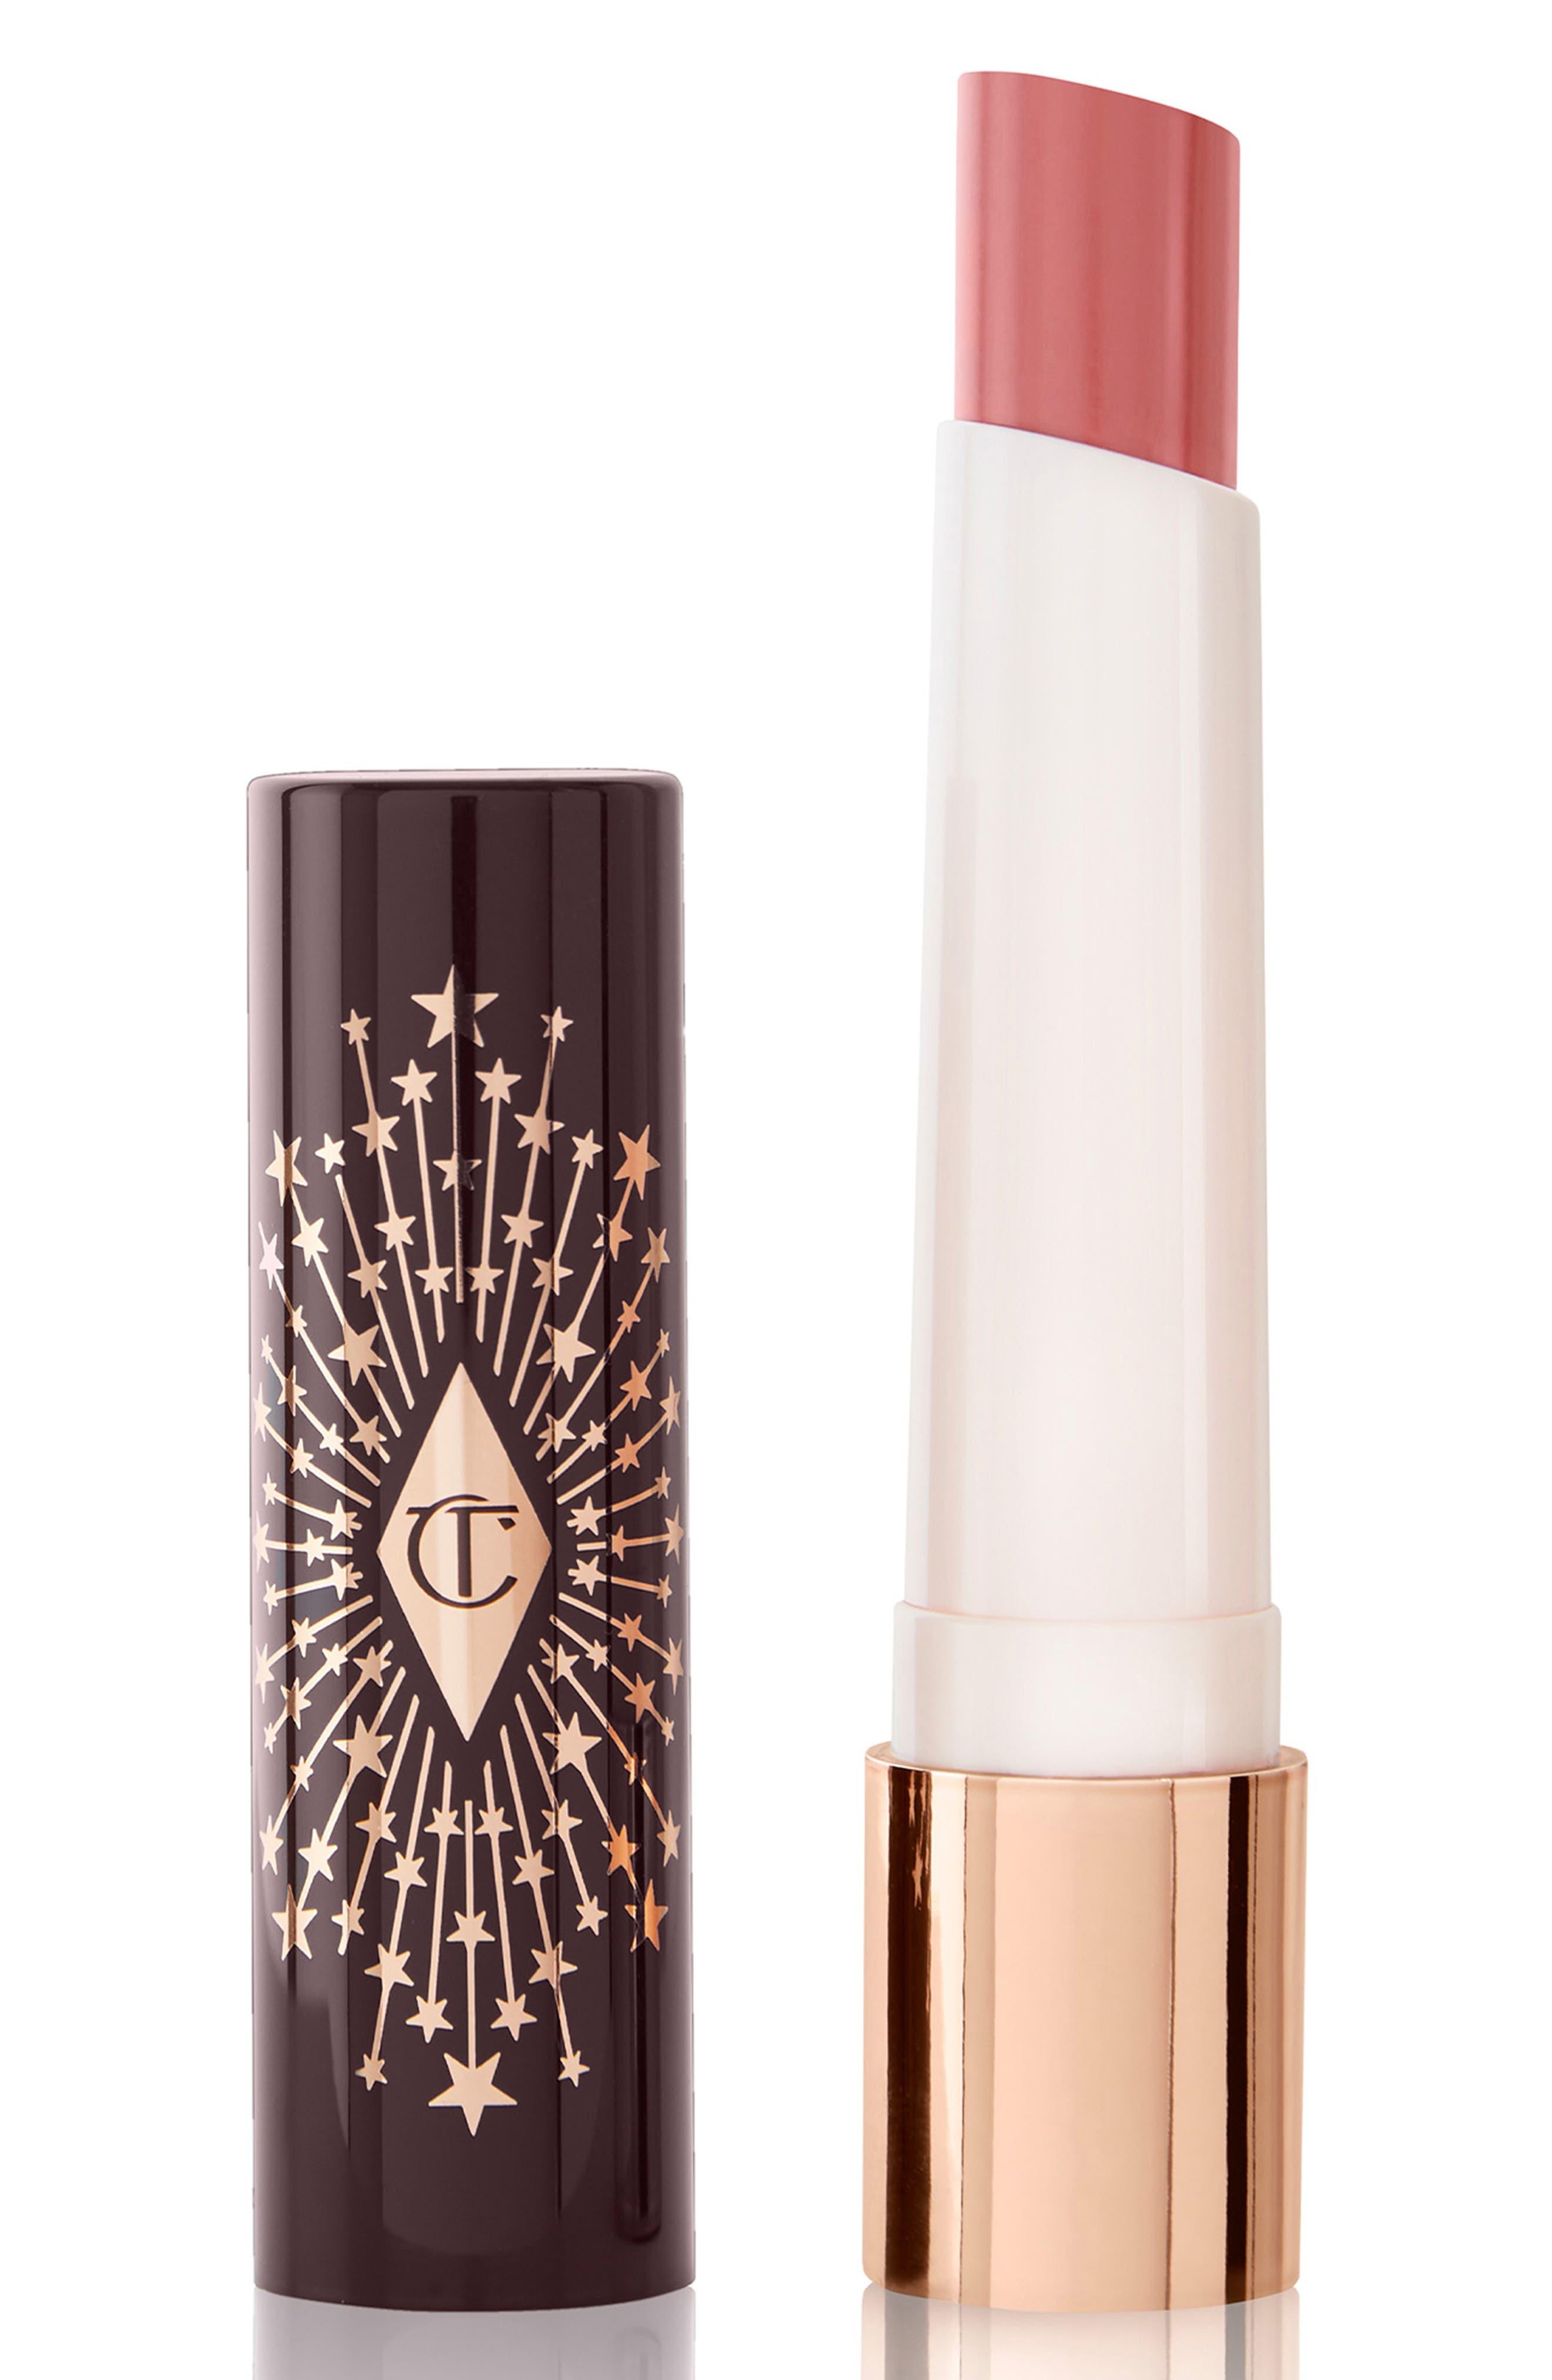 Hyaluronic Happikiss Lipstick Balm